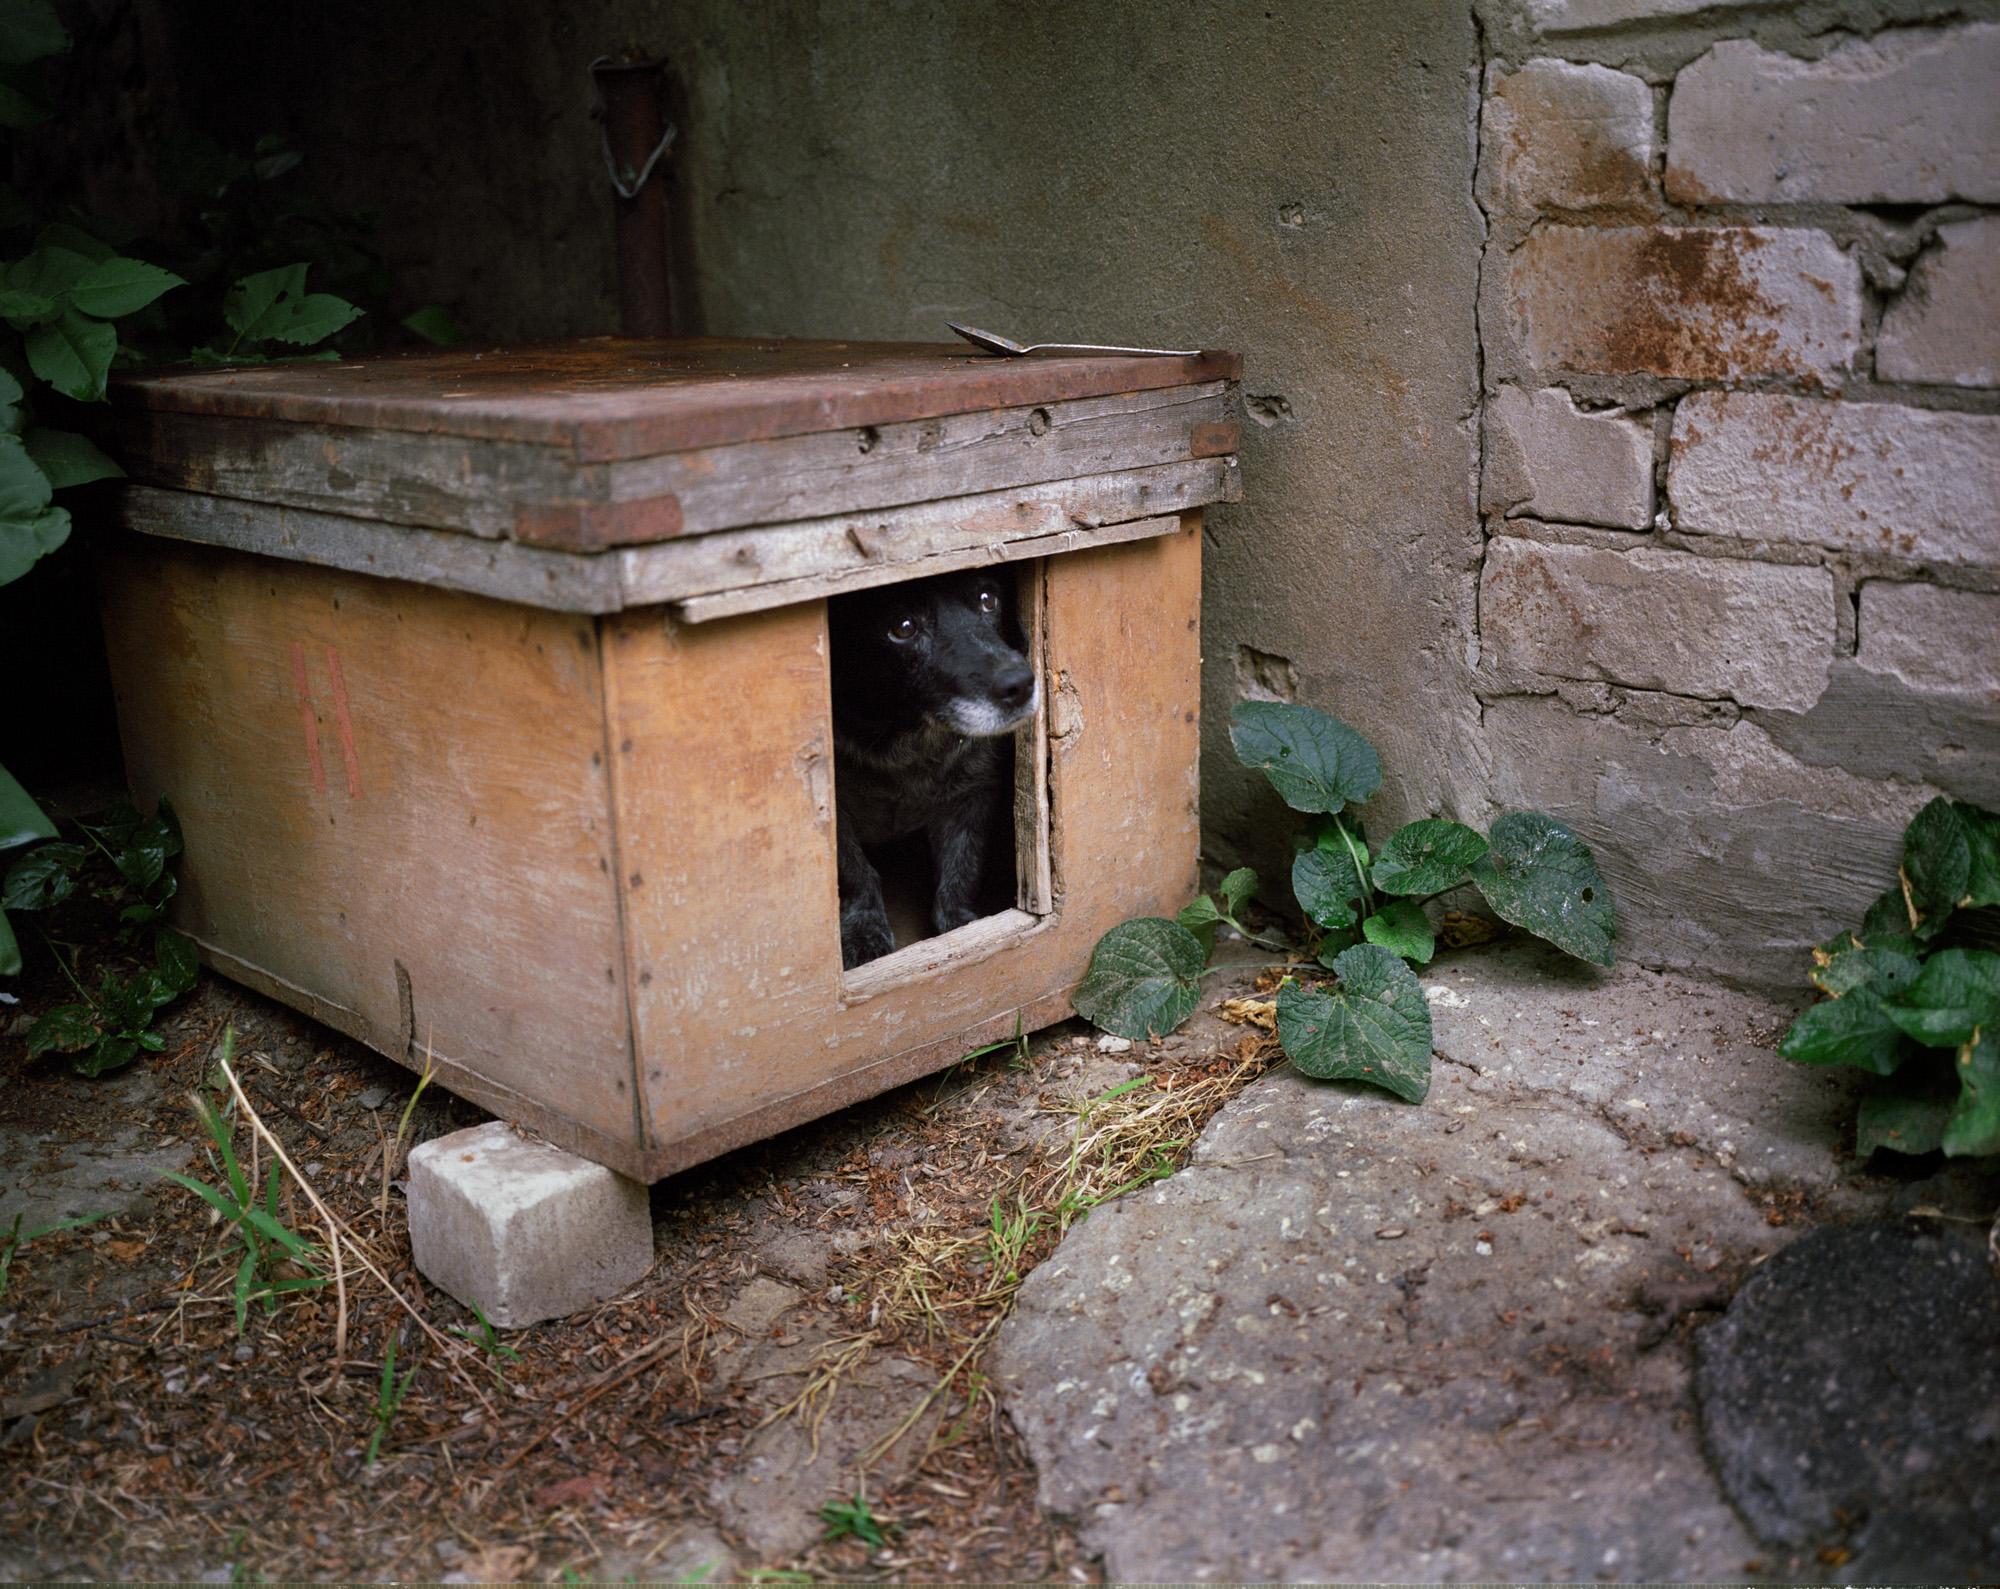 Gosia, the timid guard dog